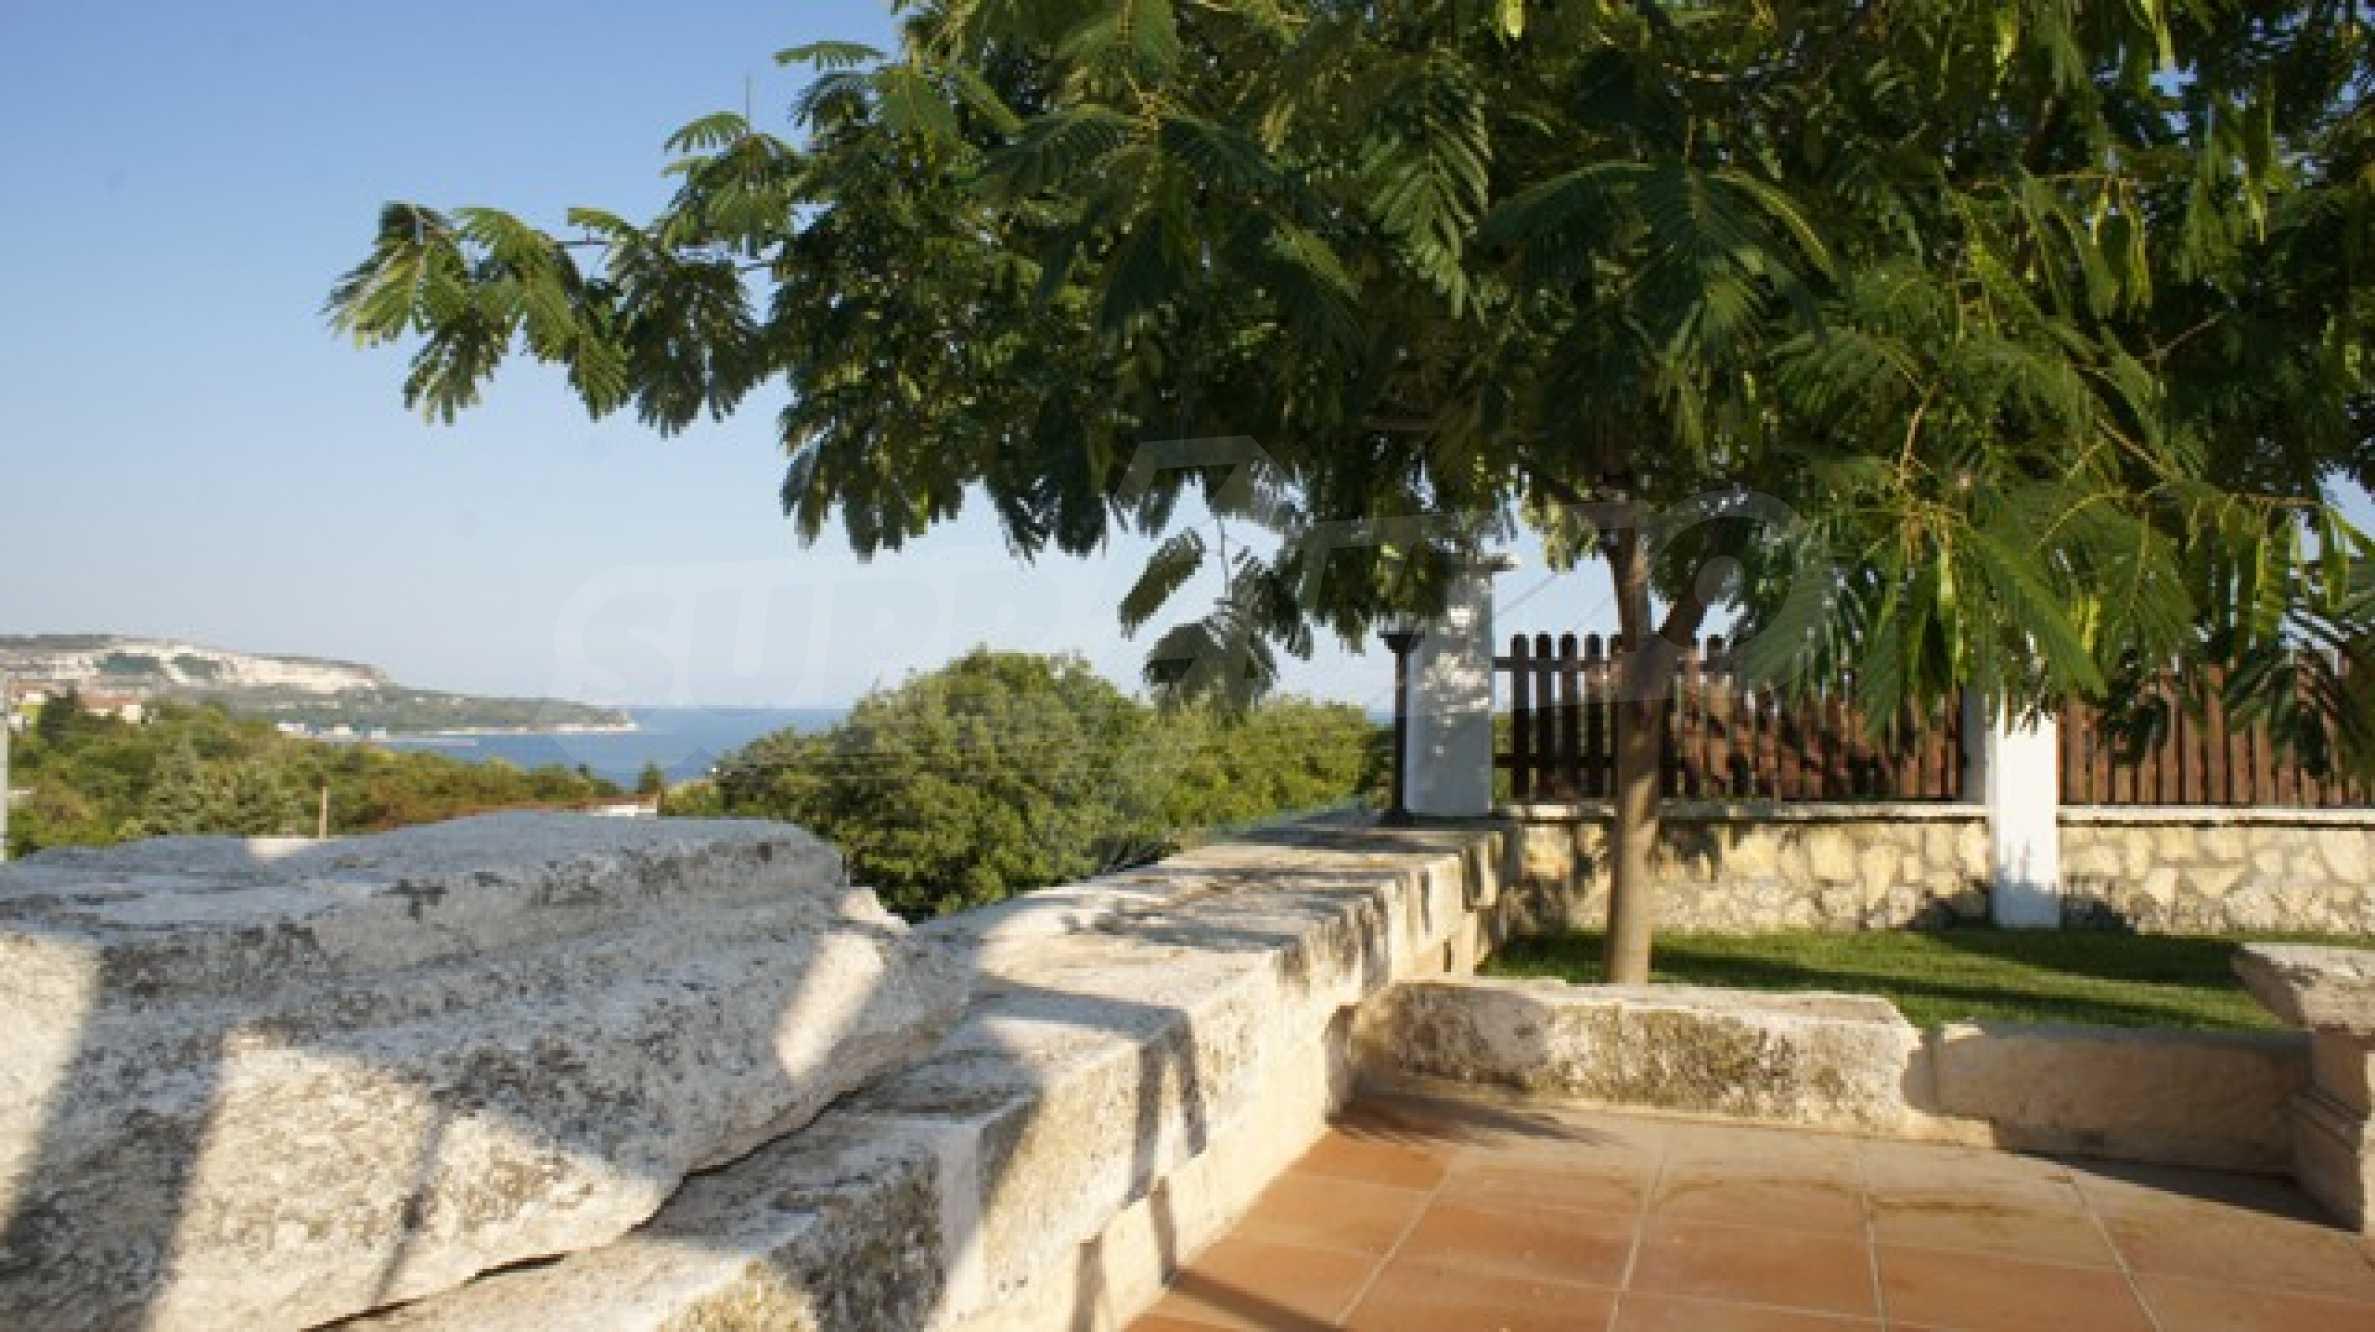 The Mediterranean style - a sense of luxury 17